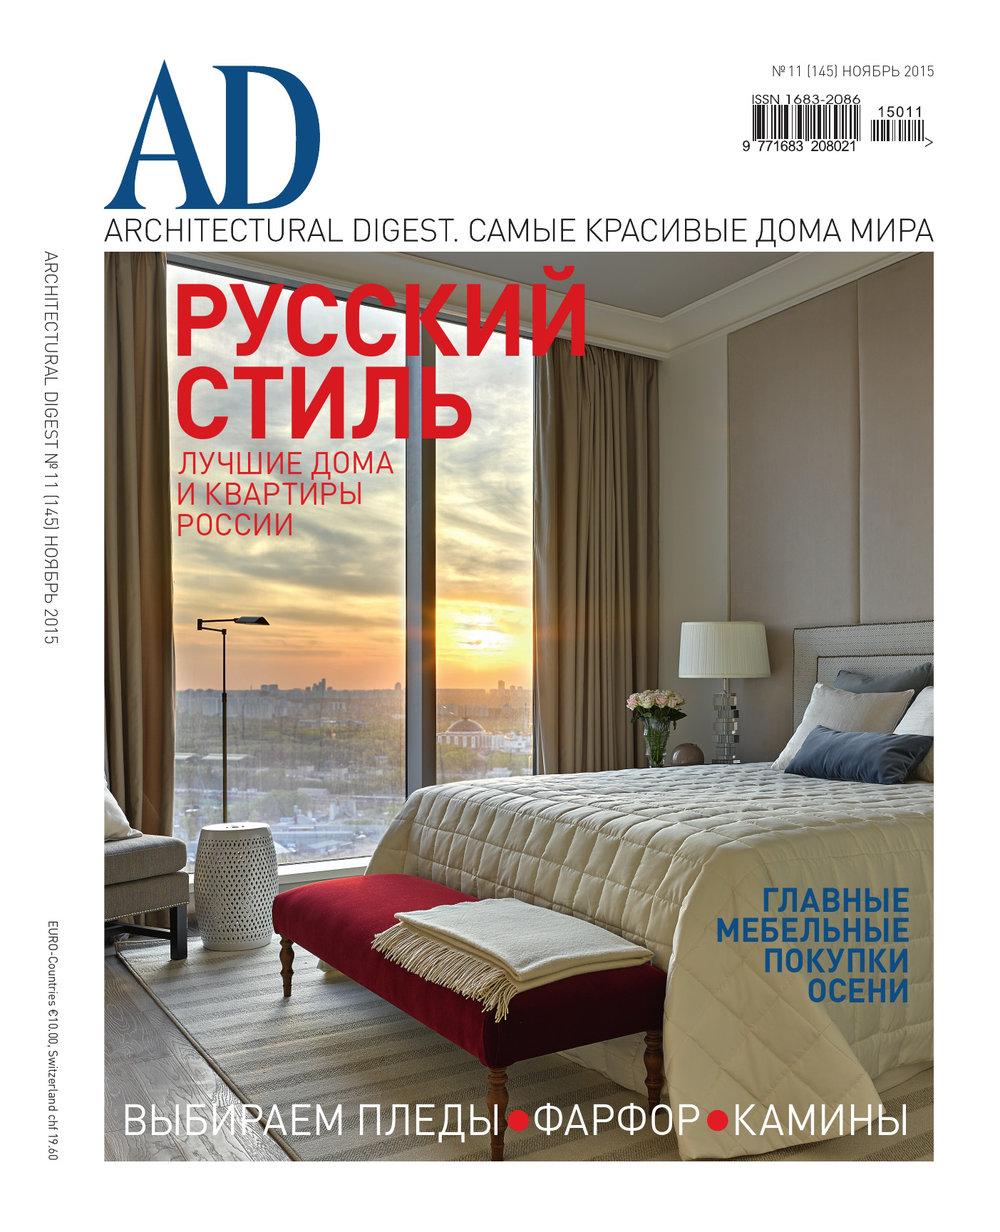 C1_AD_11_15_01.jpg